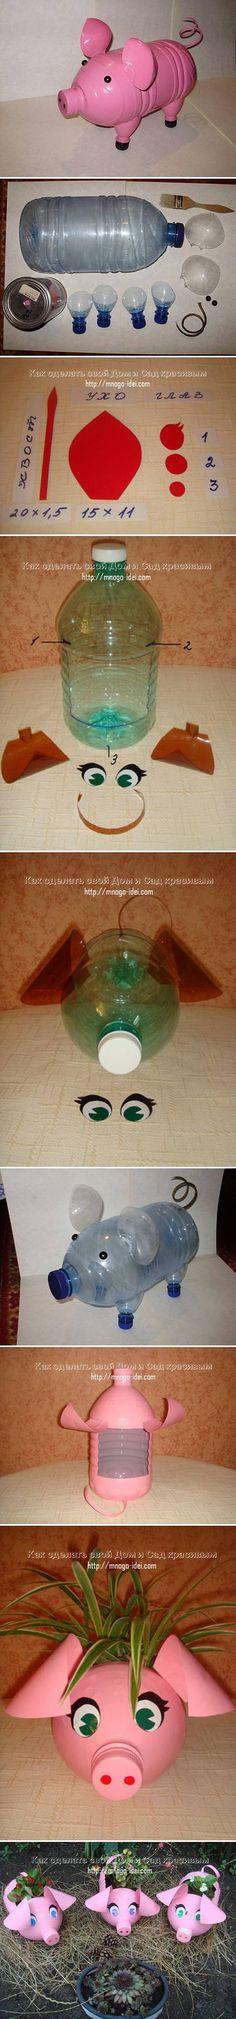 DIY Plastic Bottle Piggy Plant Vase